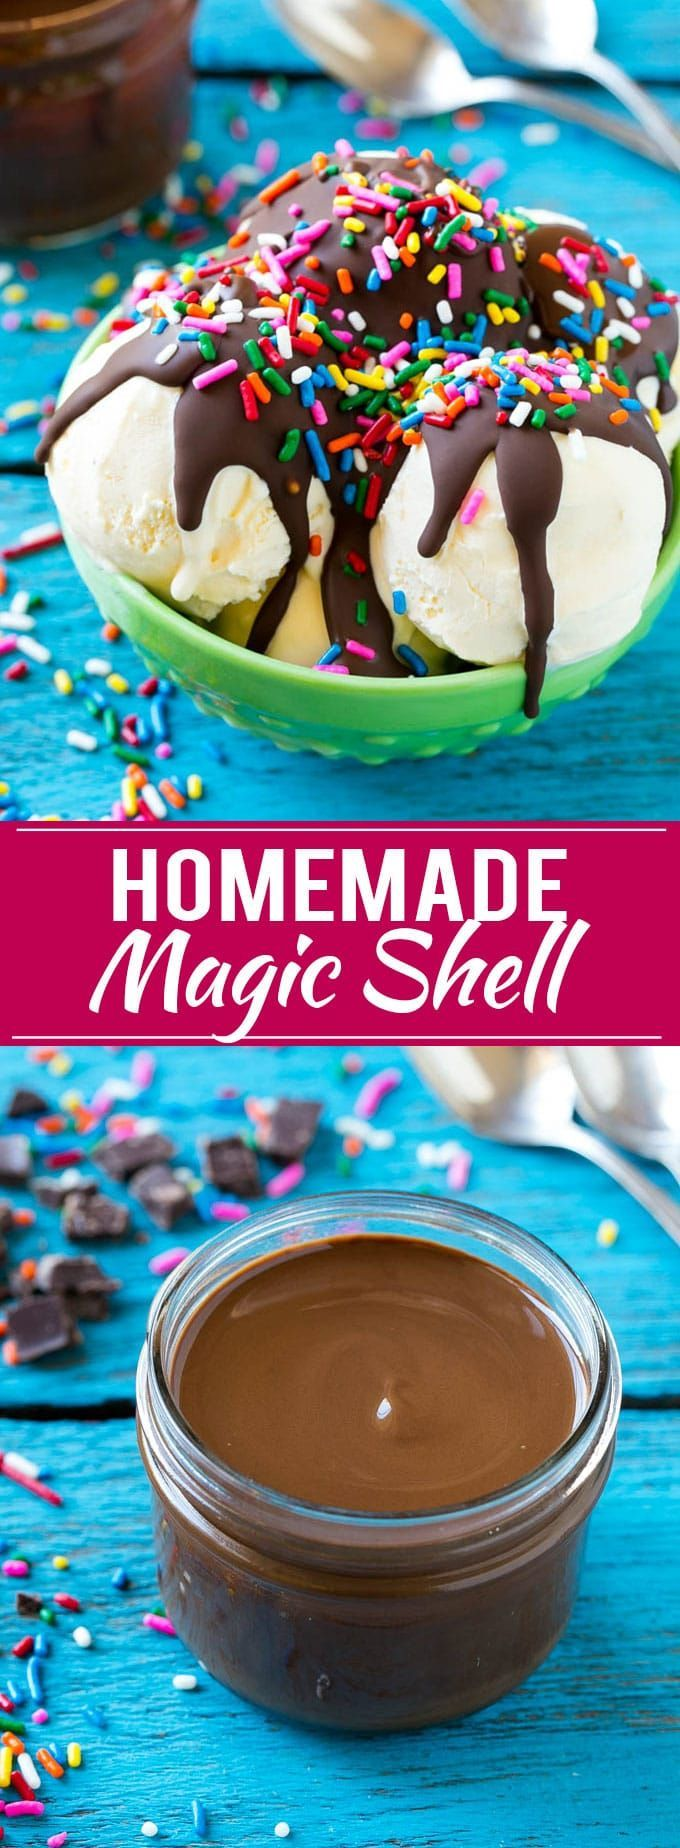 Homemade Magic Shell Recipe   Chocolate Ice Cream Topping   Chocolate Sauce   Hard Chocolate Coating